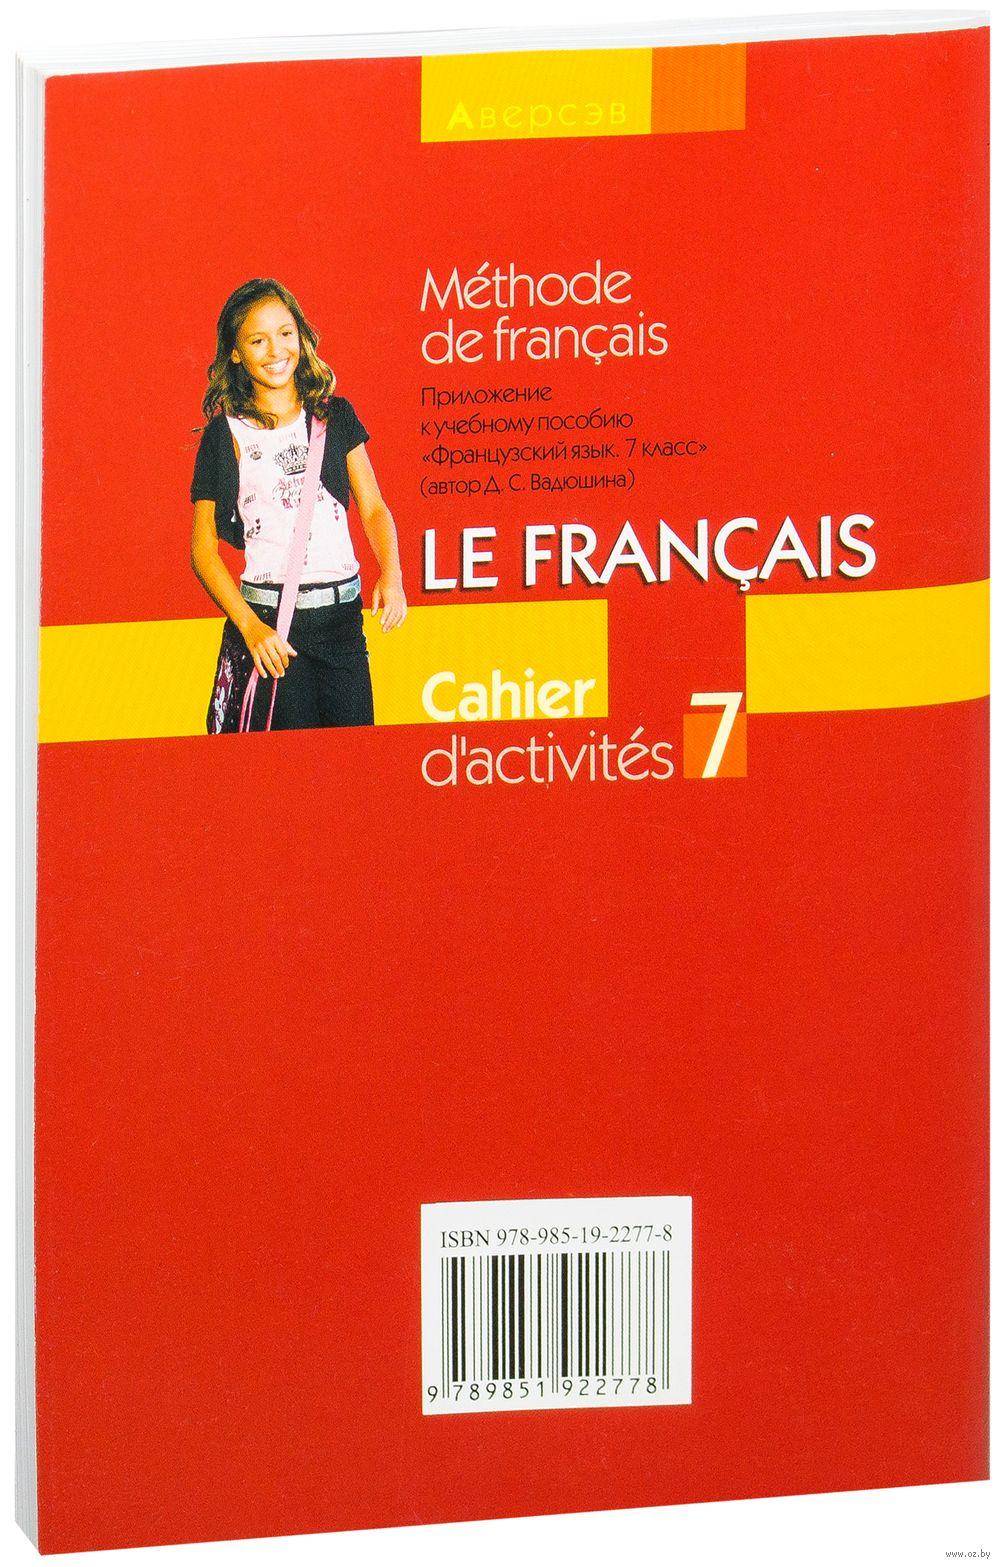 Решебник по французскому 6 класс 38 школы dfl.ibyf